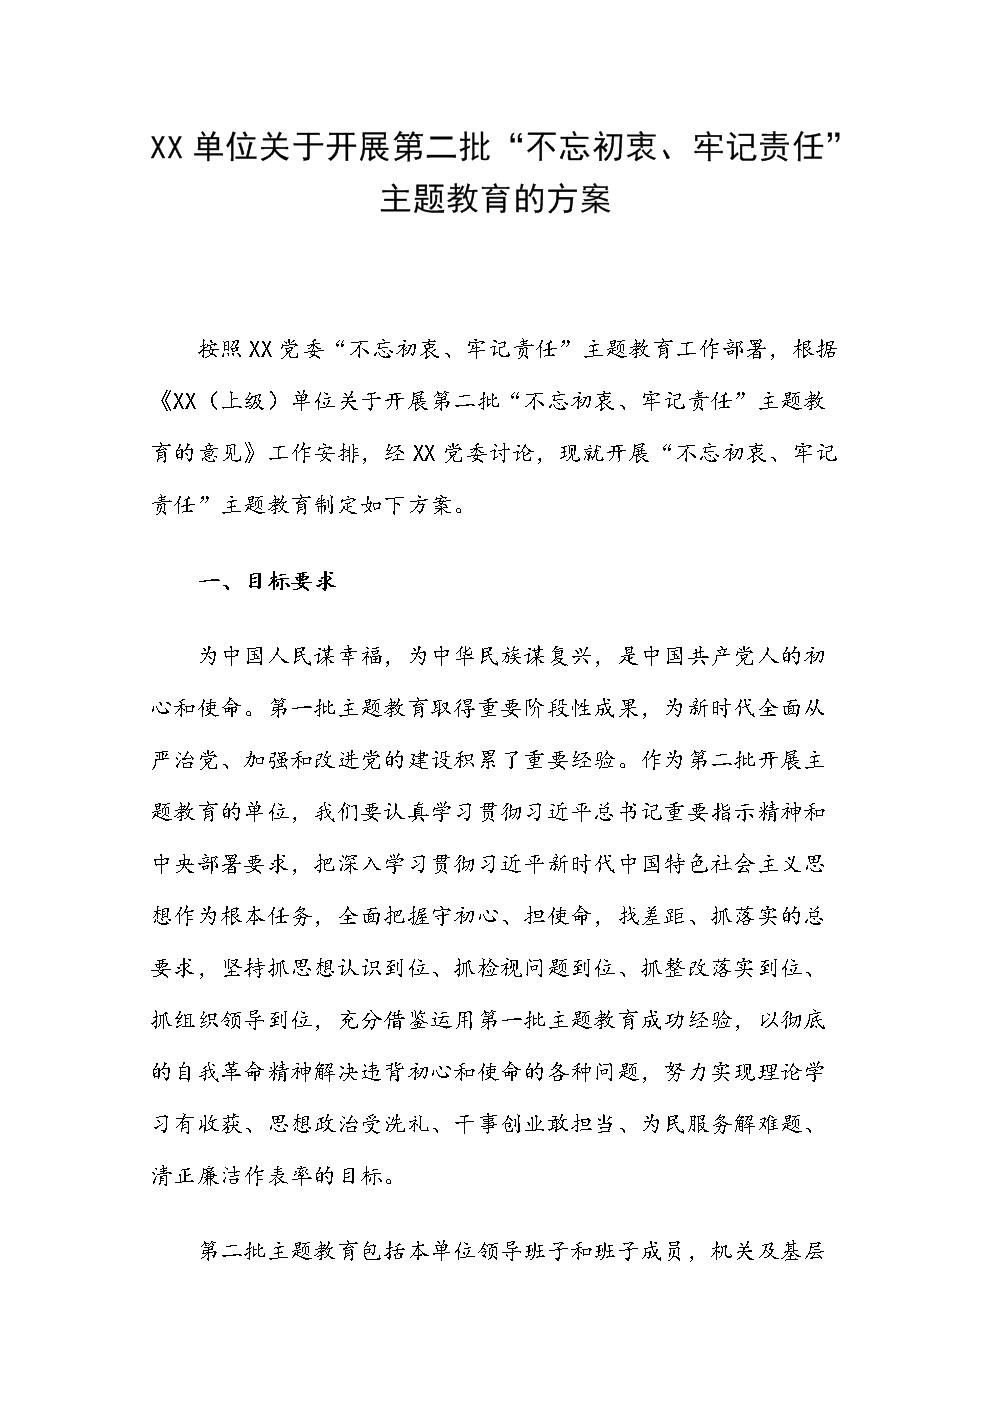 XX单位关于开展第二批主题教育的方案(对本级党委、基层党支部).docx